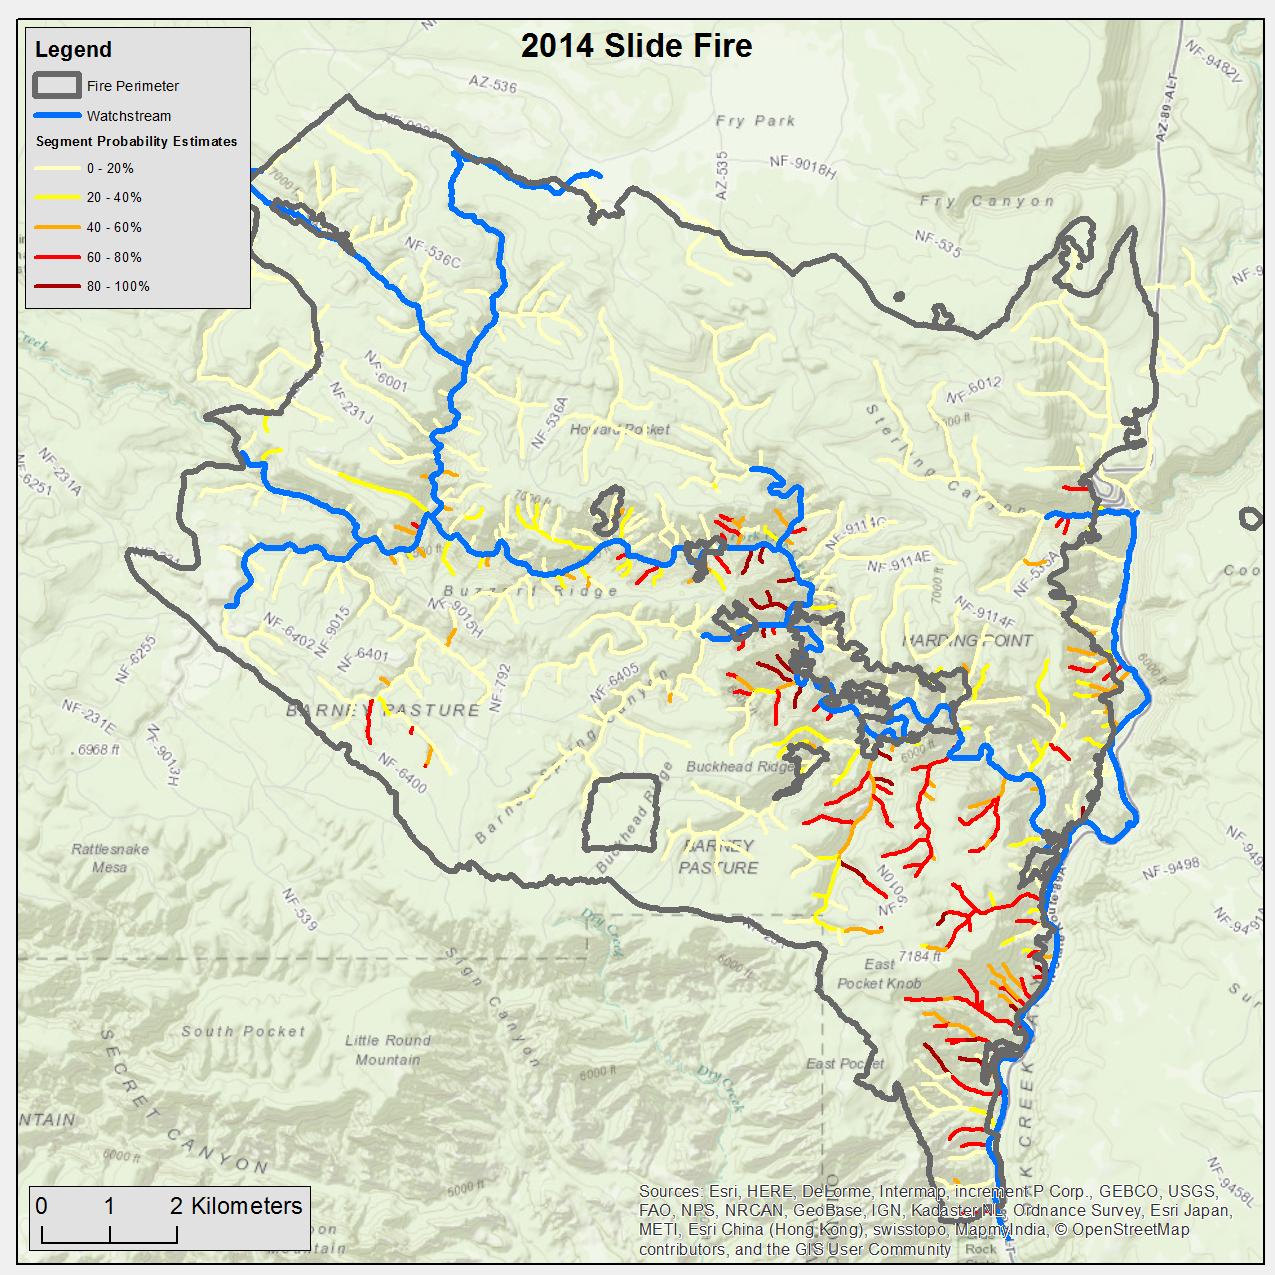 Emergency essment of Post-Fire Debris-Flow Hazards on prescott arizona map, pinal county arizona map, sonora and arizona map, city of phoenix arizona map, state of arizona county map, cochise county arizona map, mingus mountain arizona map, arizona large color map, coconino county arizona map, mohave county arizona map, arizona county lines map, flagstaff arizona map, san juan county arizona map, mount baldy arizona map, apache county arizona map, gila county arizona map, navajo county arizona map, city of cottonwood arizona map, sun city arizona zip code map, black canyon city arizona map,